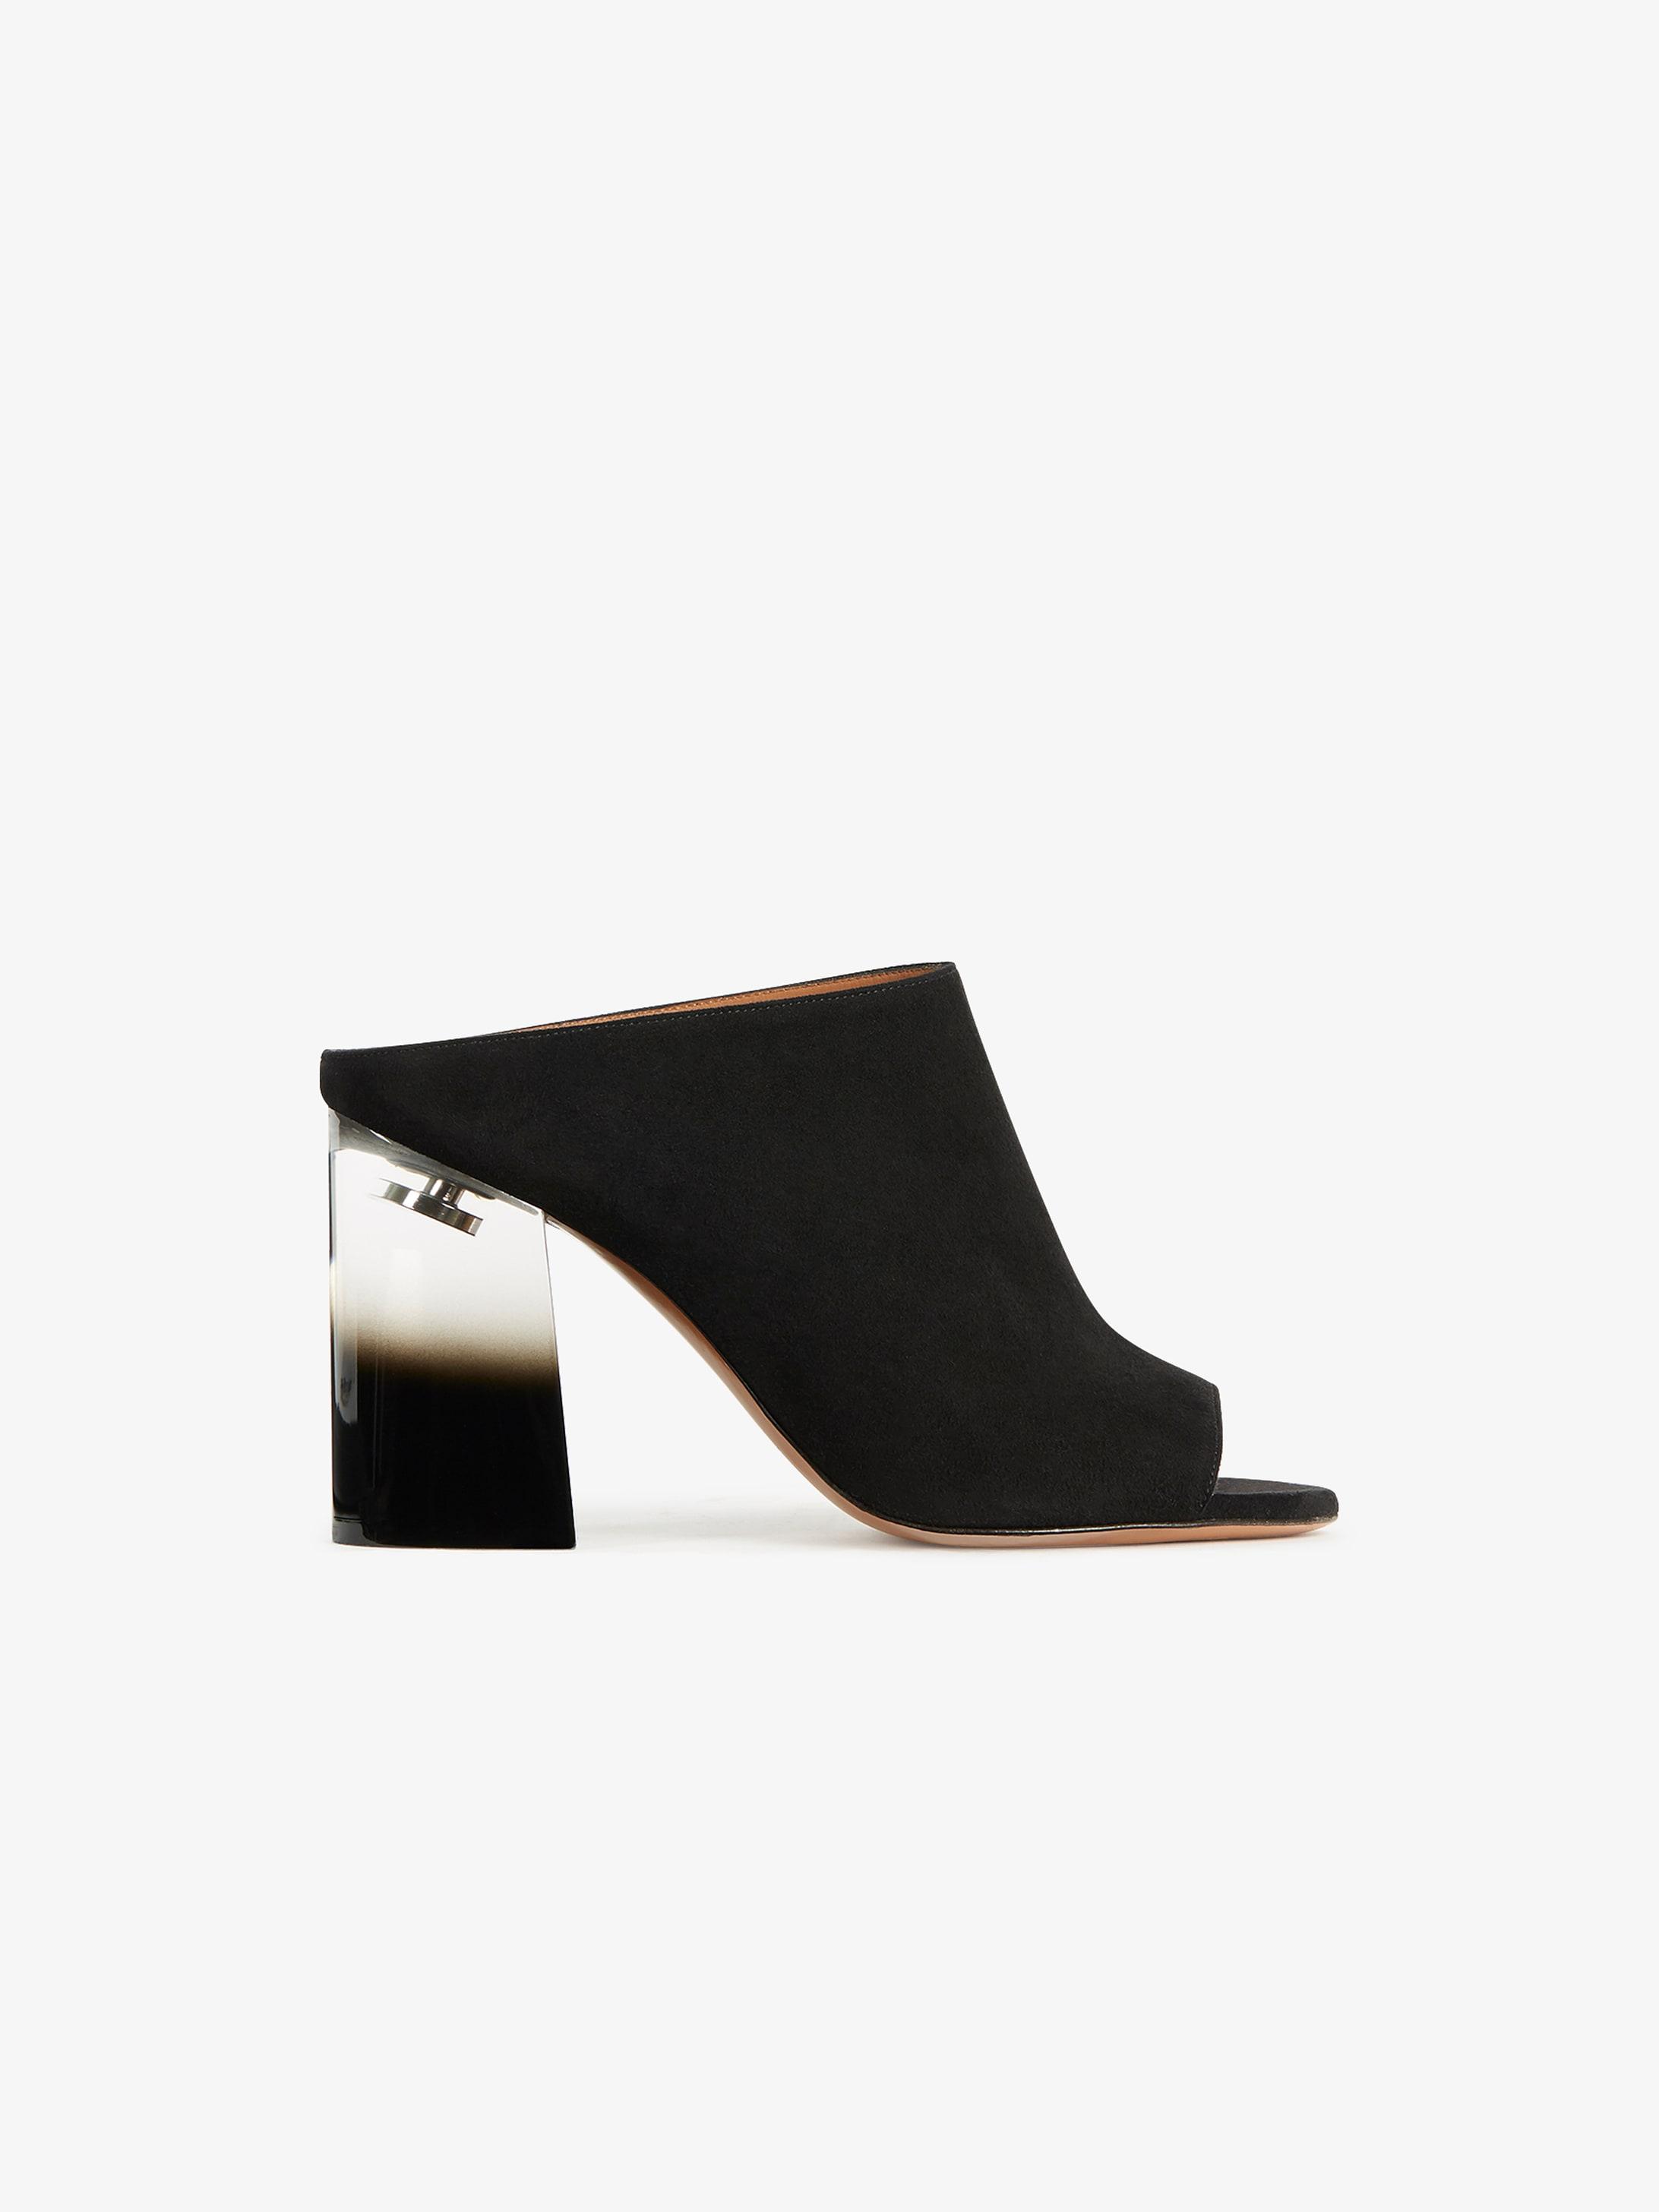 Suede mules with plexiglas heels